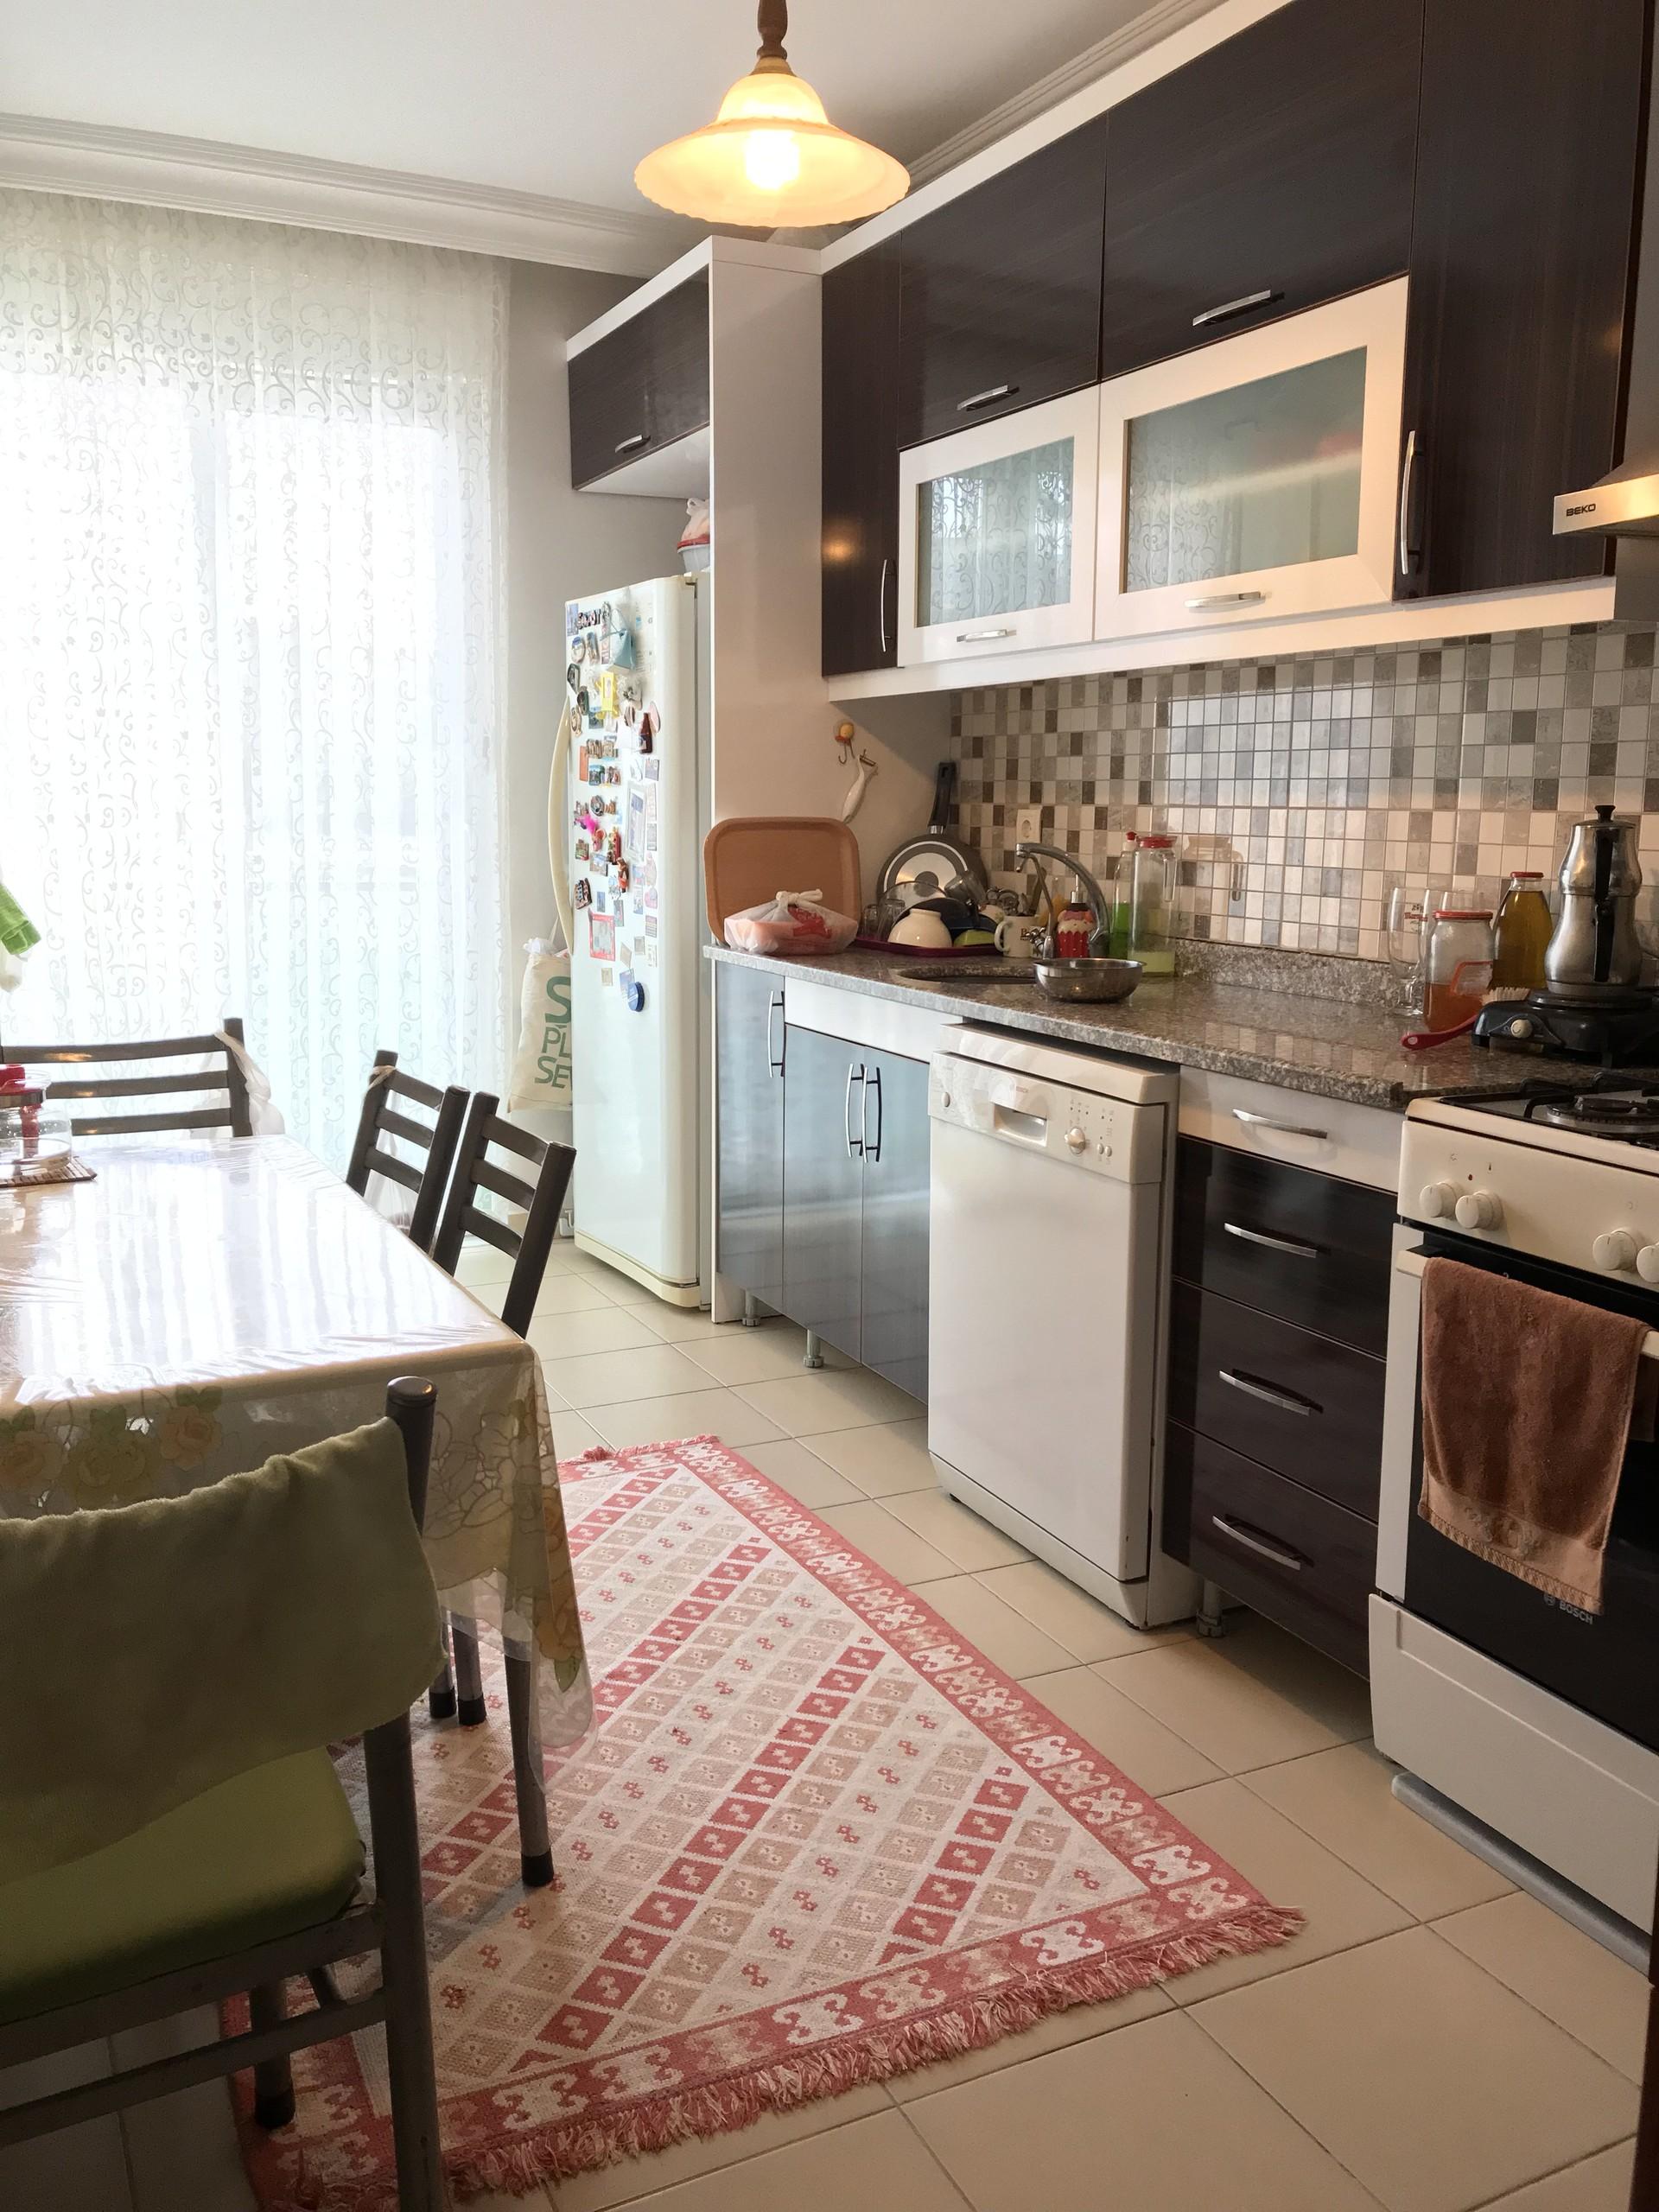 a-single-furnished-room-center-near-university-040df85767062ea11753f2b885f9110d